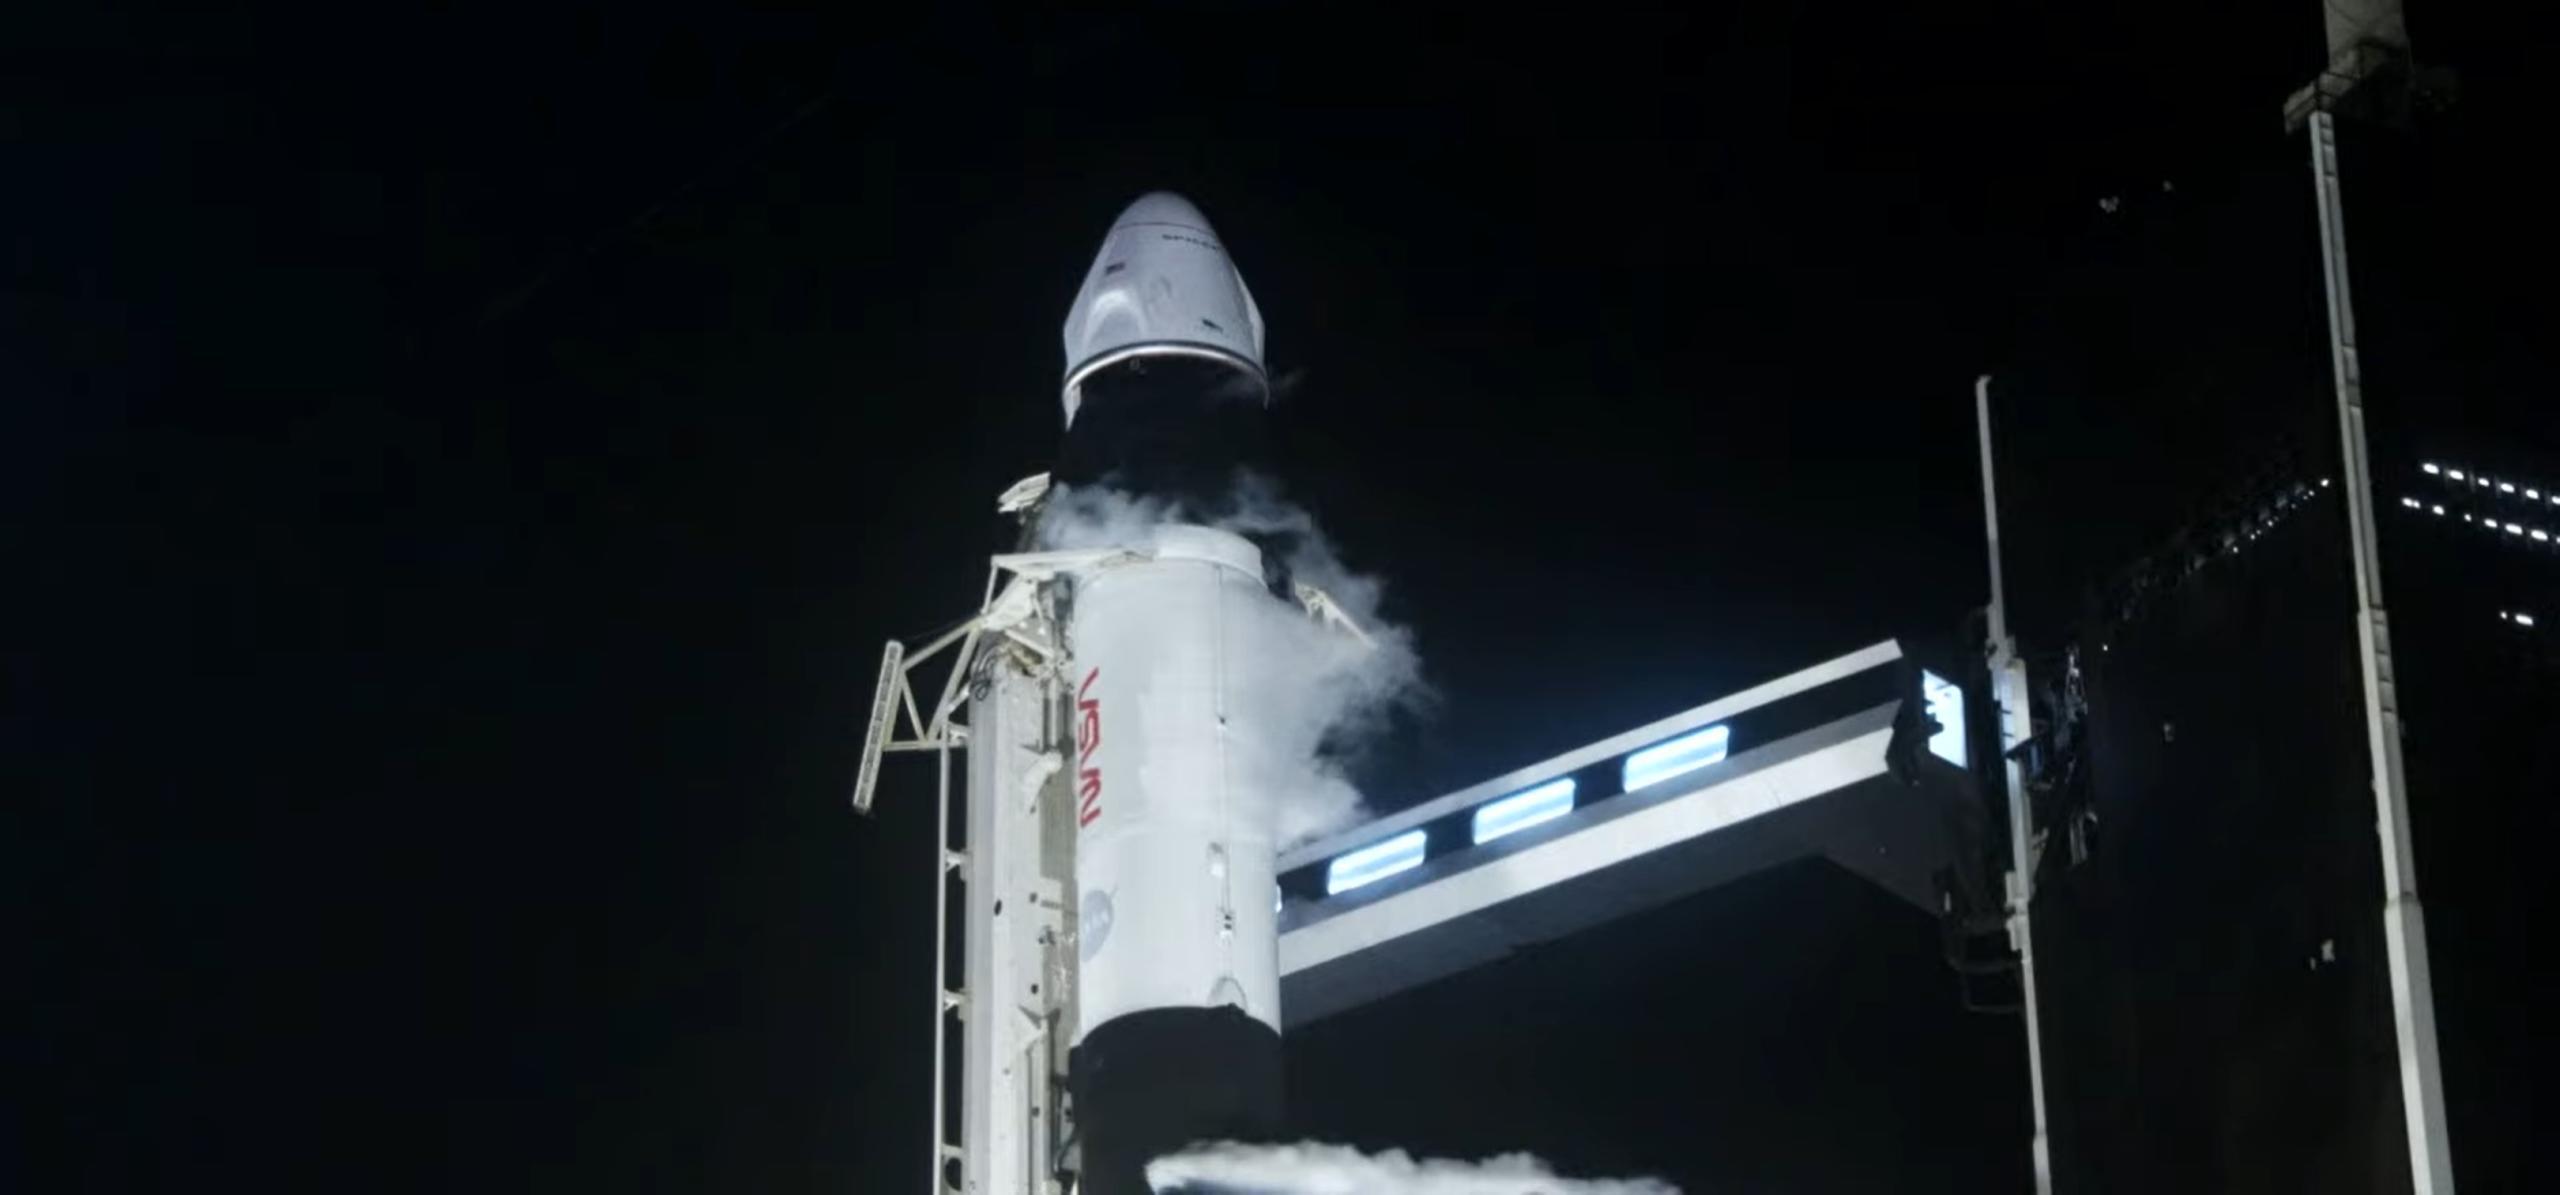 Crew-2 Crew Dragon C206 Falcon 9 B1061 042321 webcast (SpaceX) 13 (c)